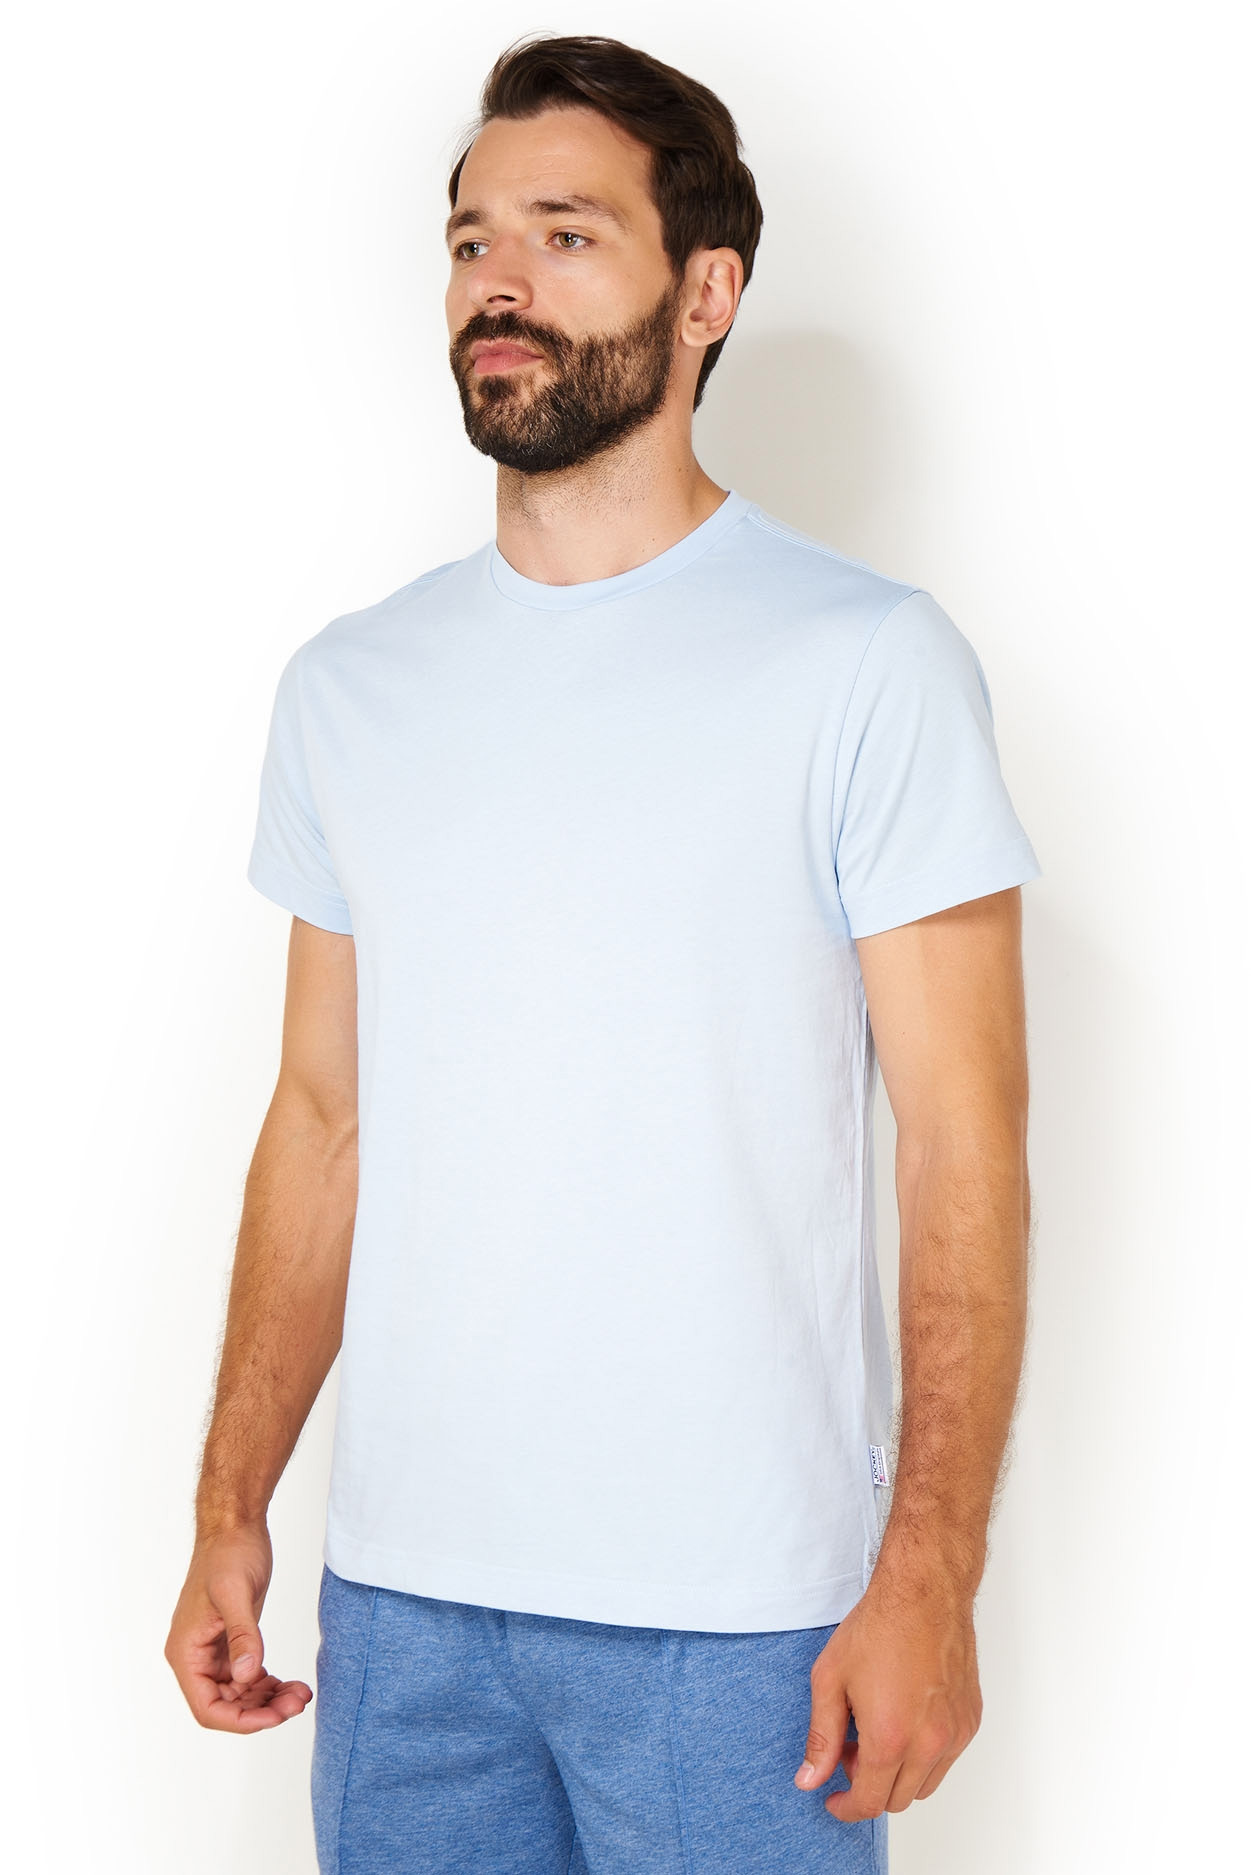 Футболка мужская 120100H светло-голубой Jockey